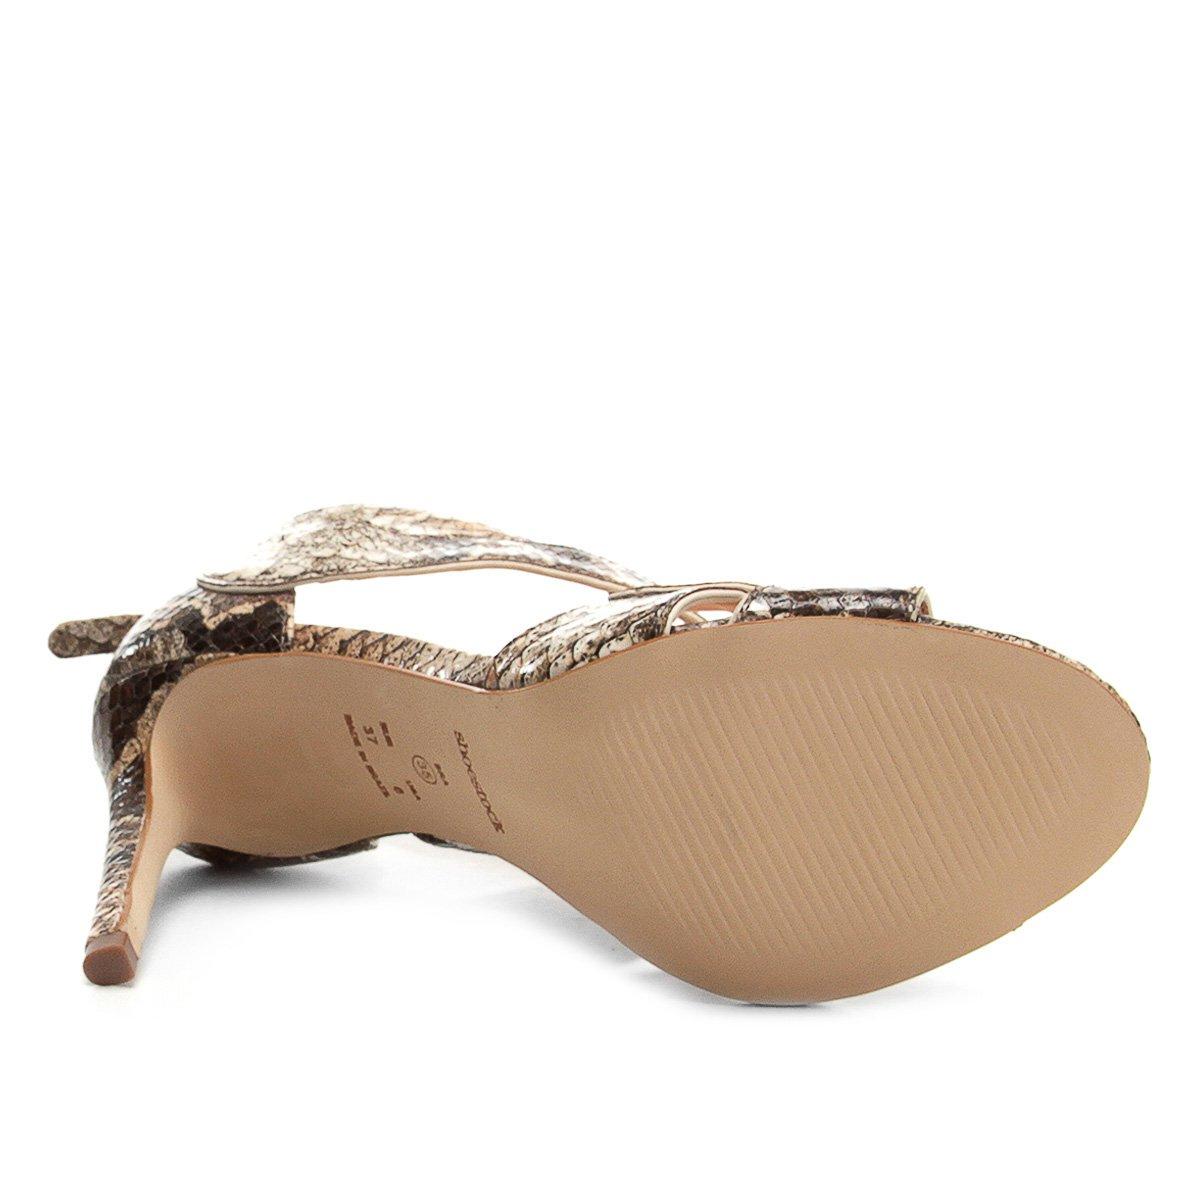 Couro Sandália Alto Sandália Ondas Shoestock Cobra Shoestock Feminina Shoestock Salto Alto Ondas Cobra Couro Feminina Couro Sandália Salto CnIPq